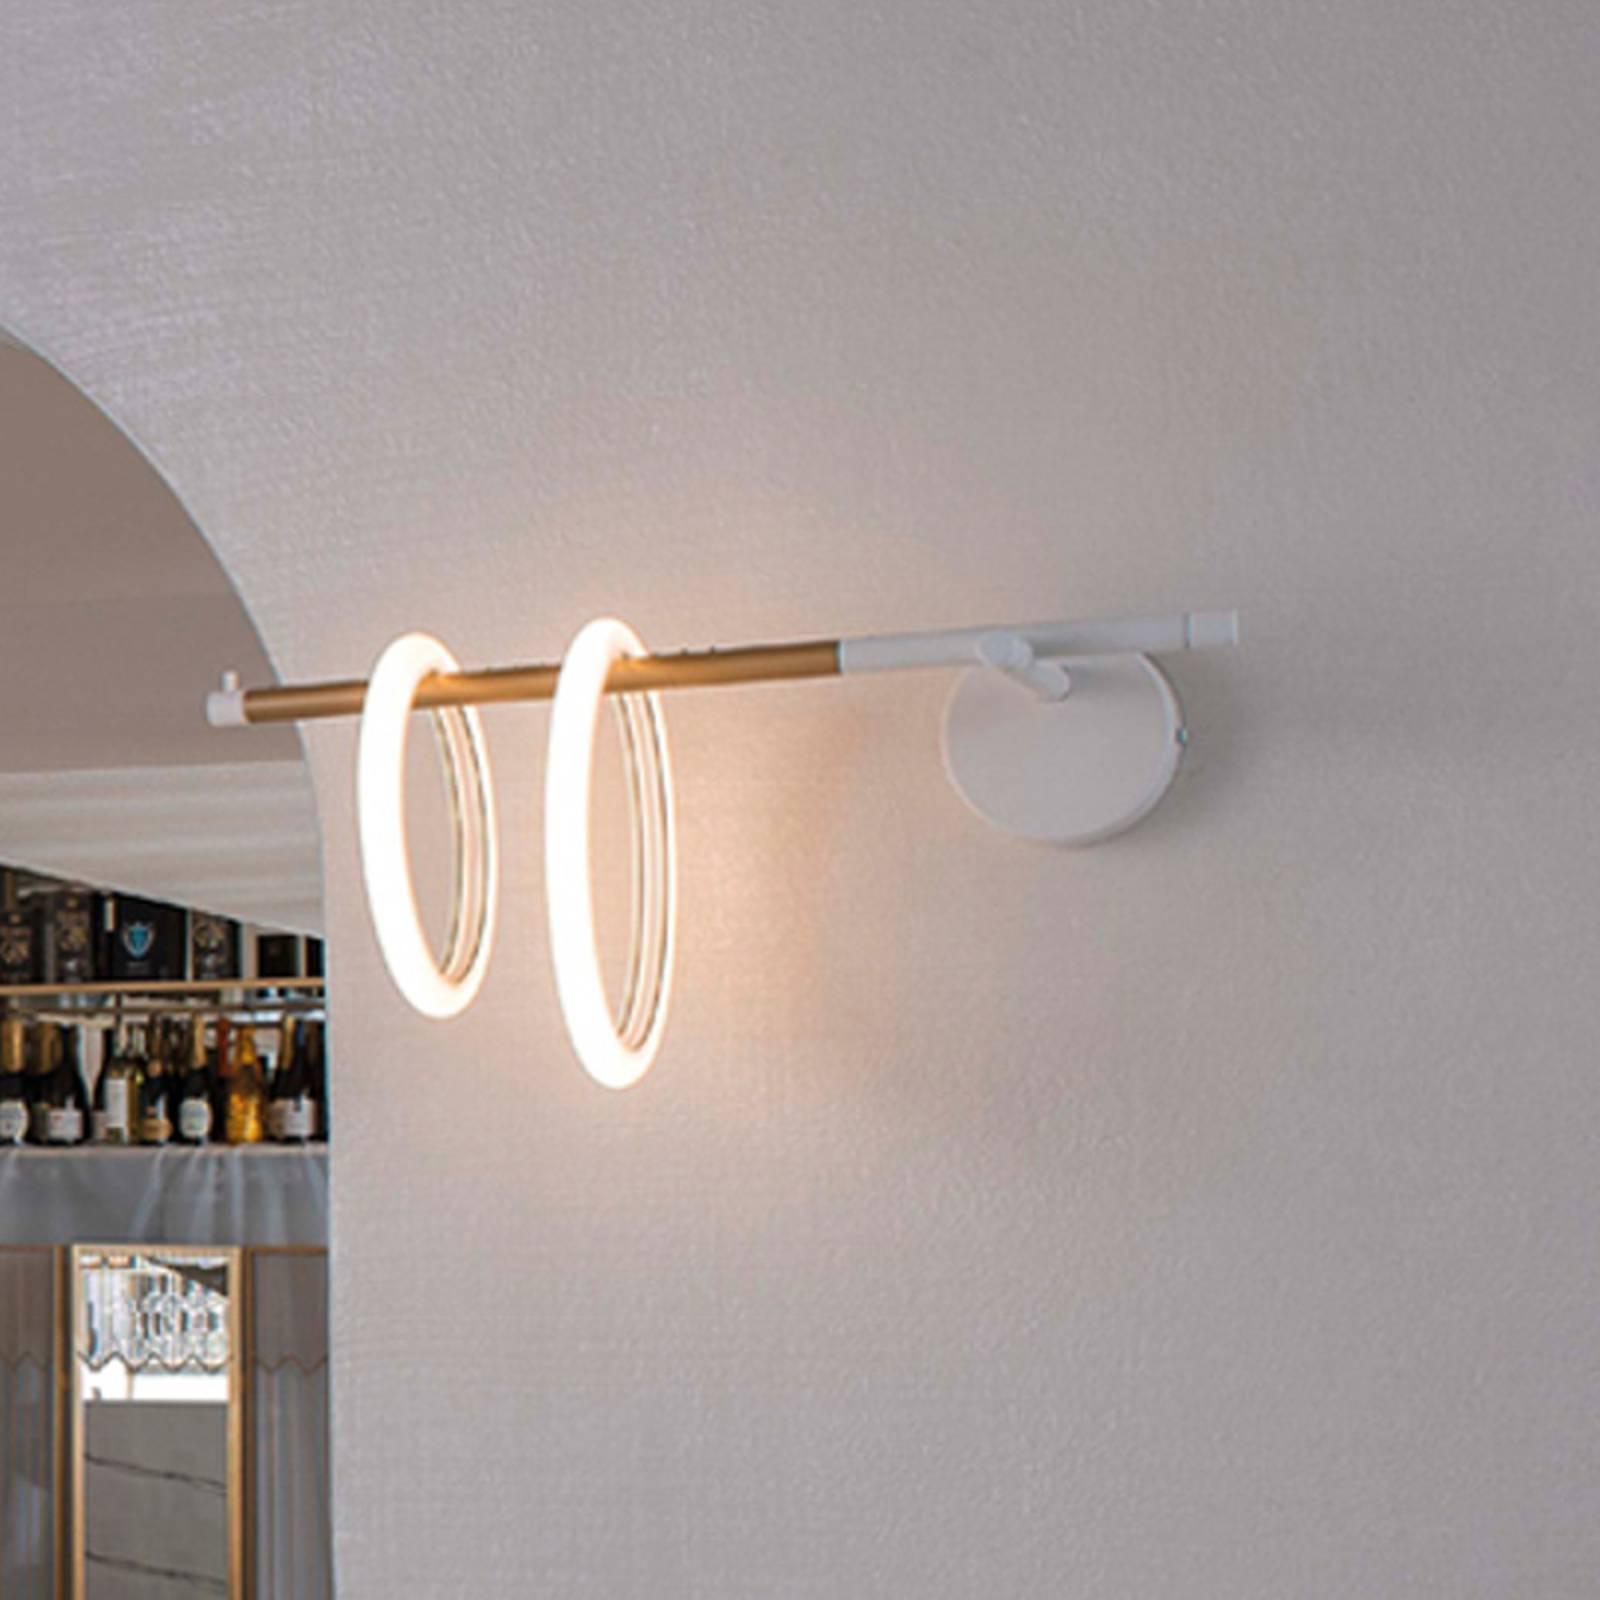 LED-Wandleuchte Ulaop, zwei Ringe, links, weiß